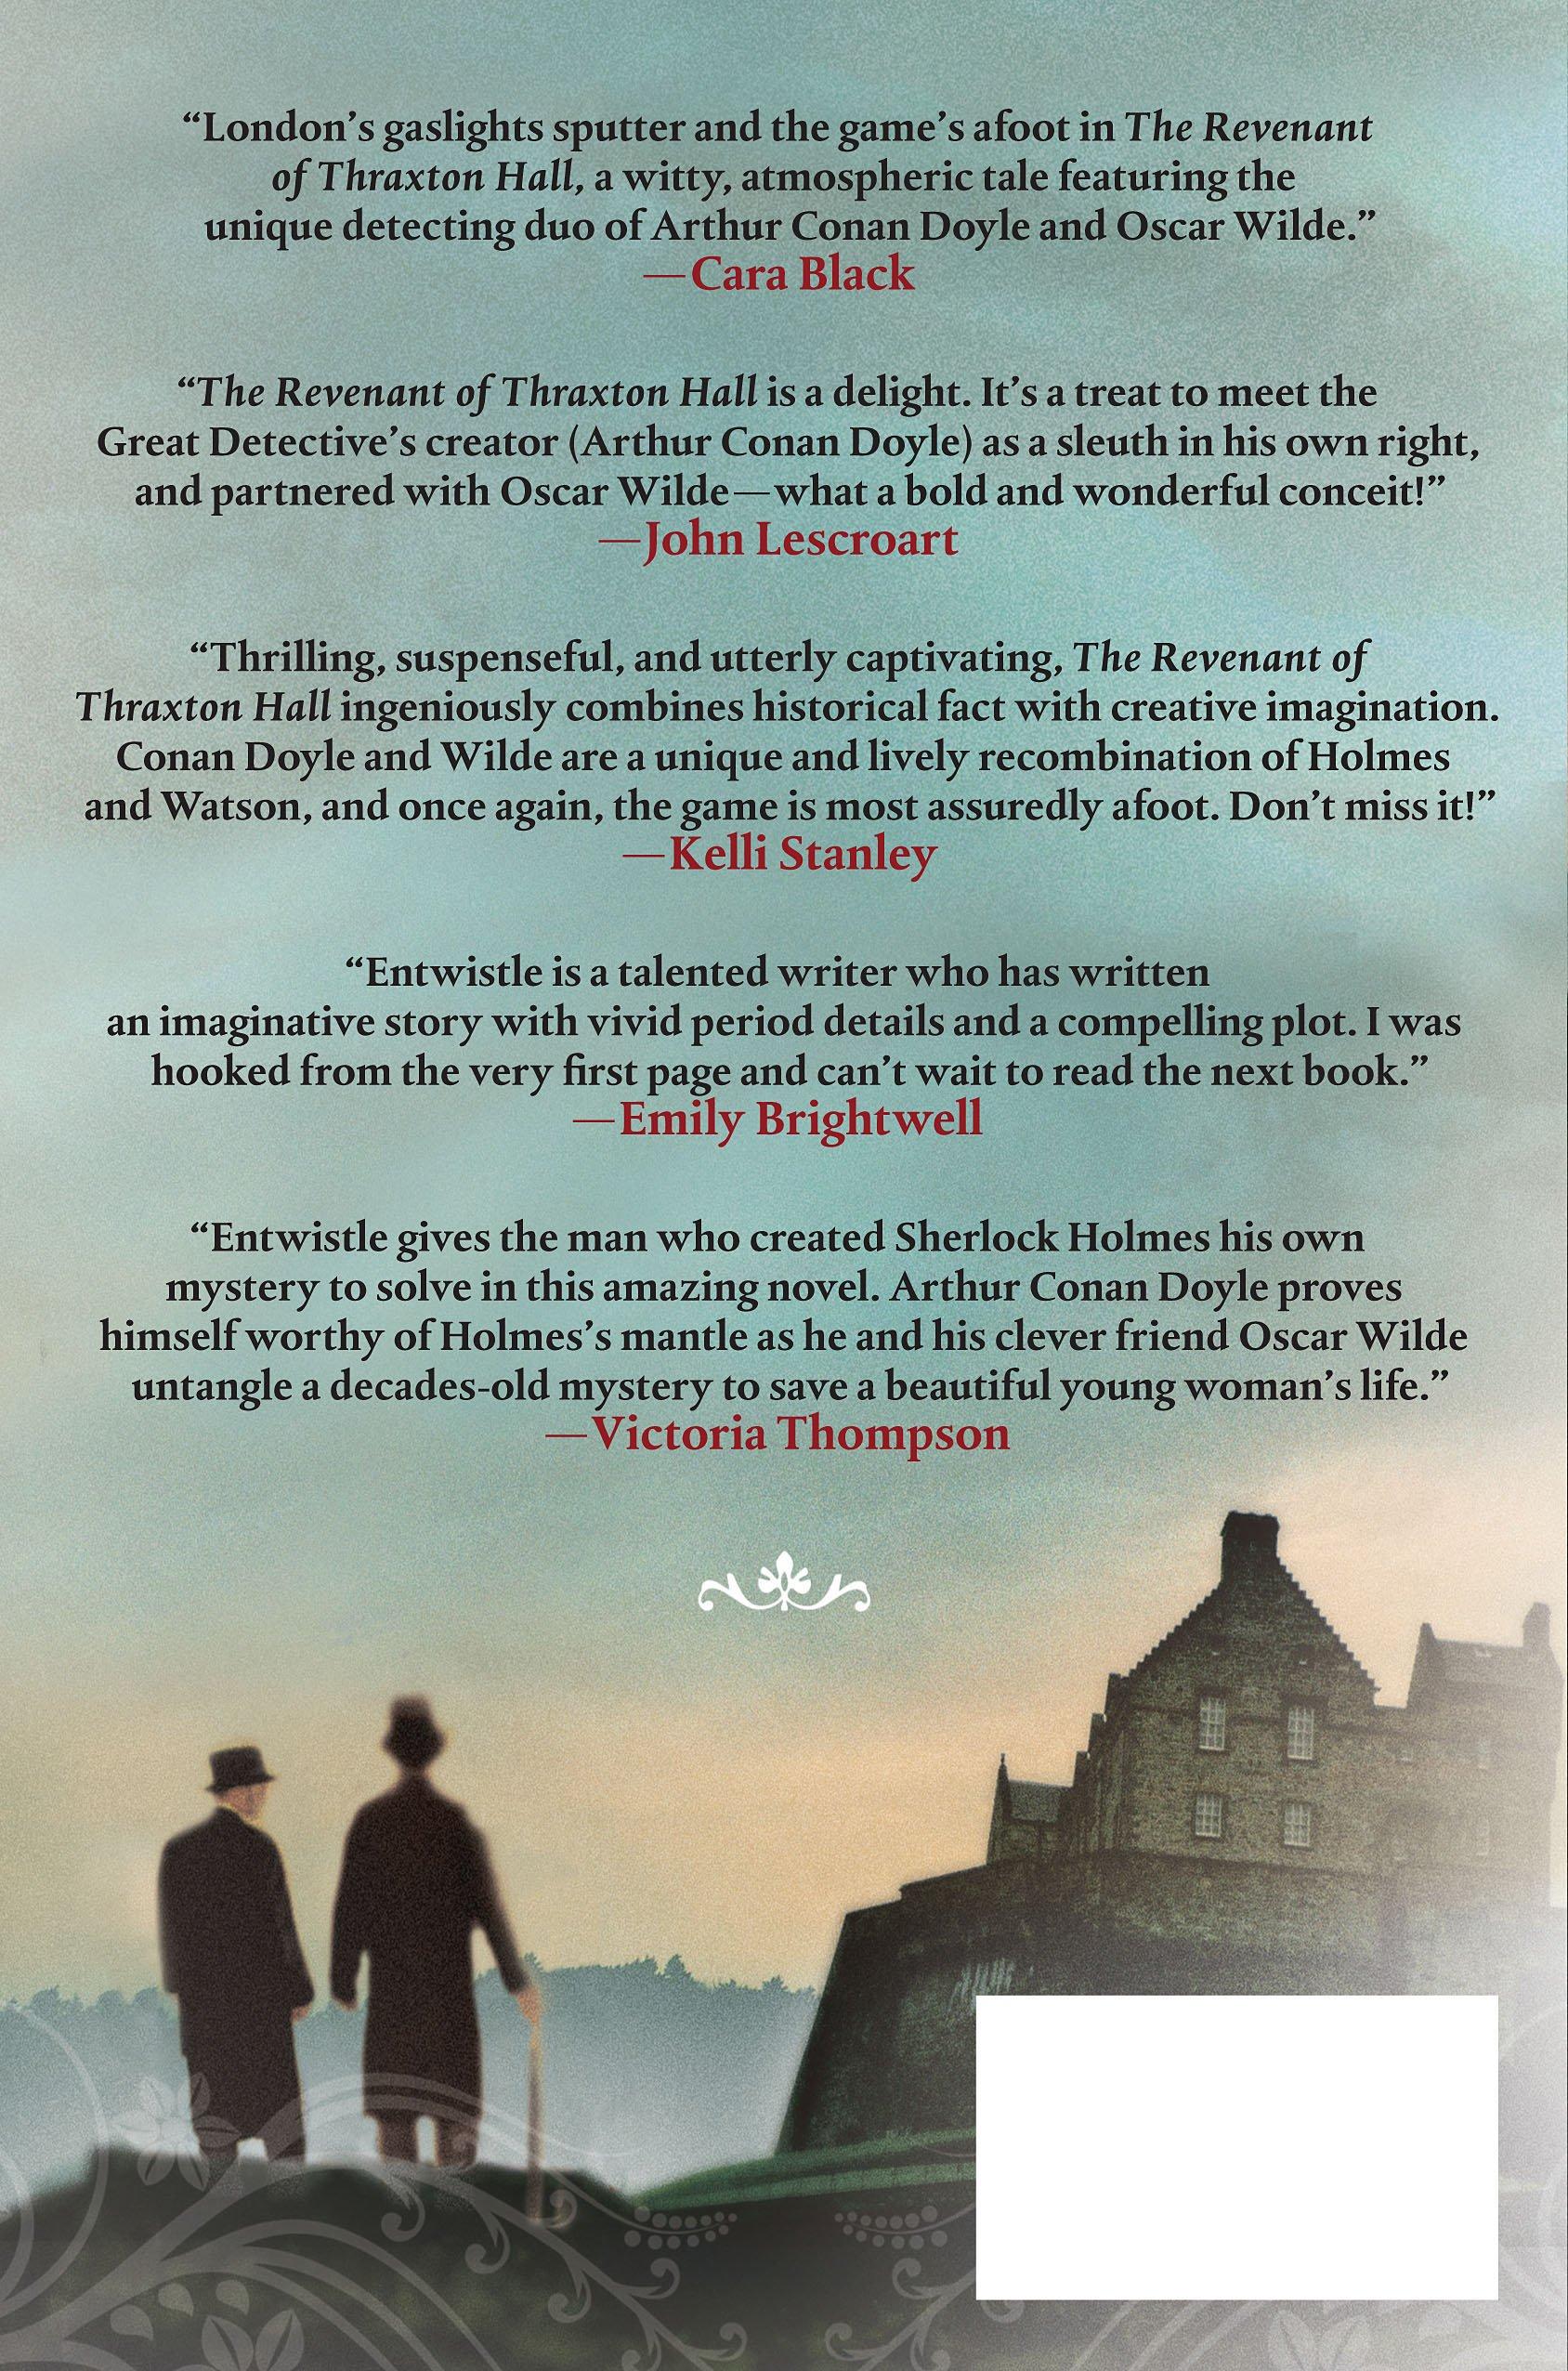 The Revenant Of Thraxton Hall: The Paranormal Casebooks Of Sir Arthur Conan  Doyle: Vaughn Entwistle: 9781250035004: Amazon: Books